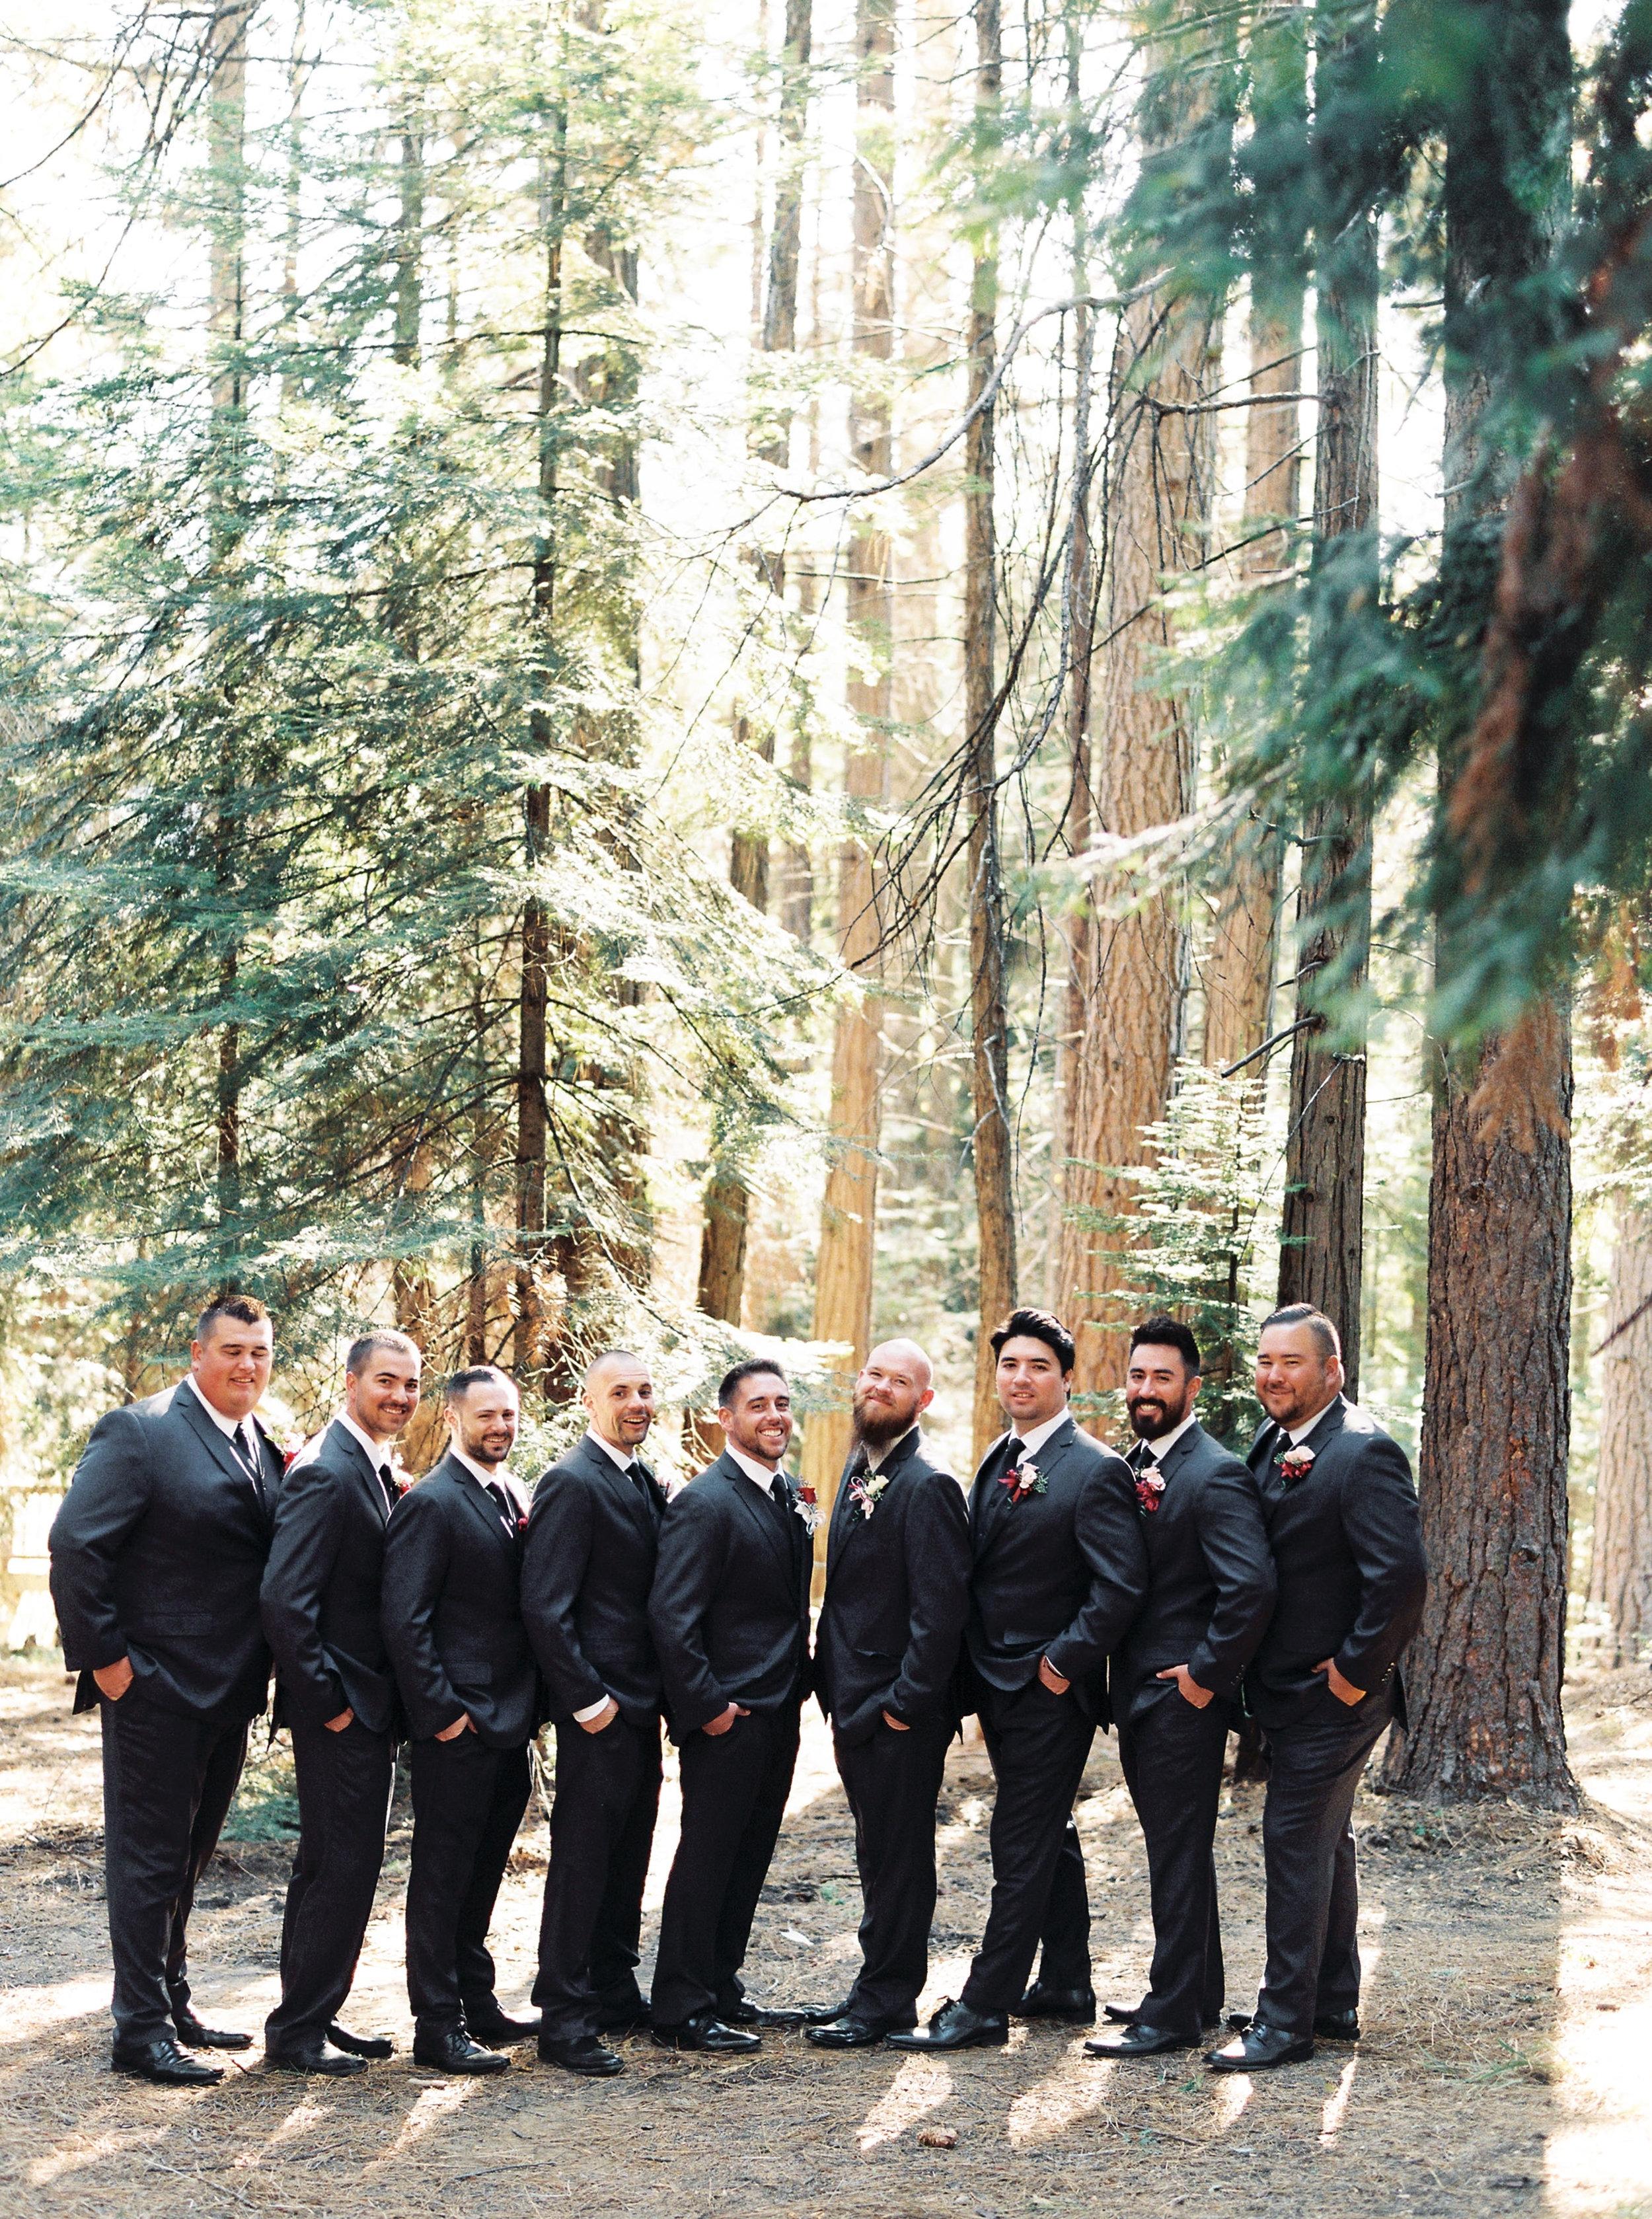 Tenaya-lodge-wedding-at-yosemite-national-park-california-95.jpg